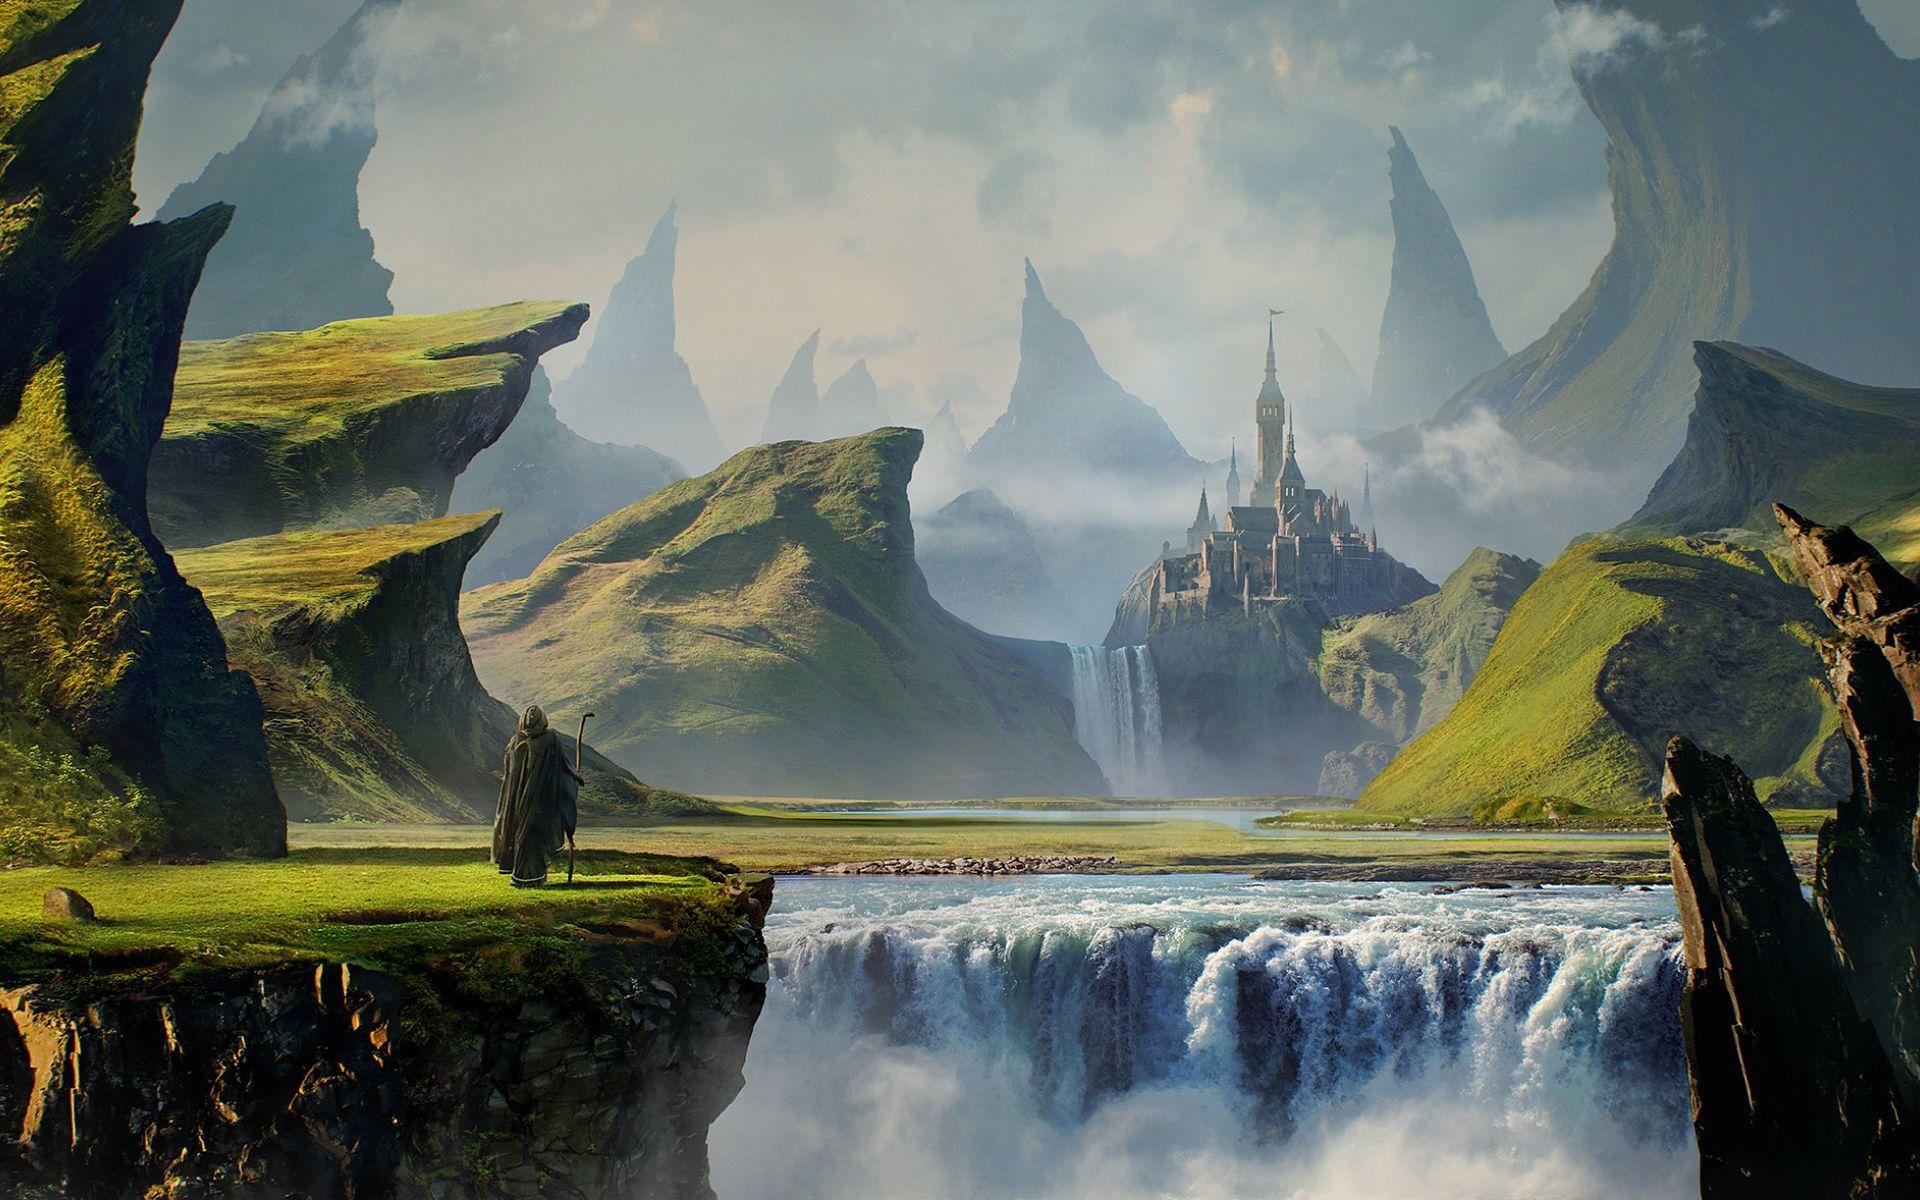 Lord Of The Rings Inspired 3D Wallpaper Digital Cgi Artwork LOTR Fantasy Landscape